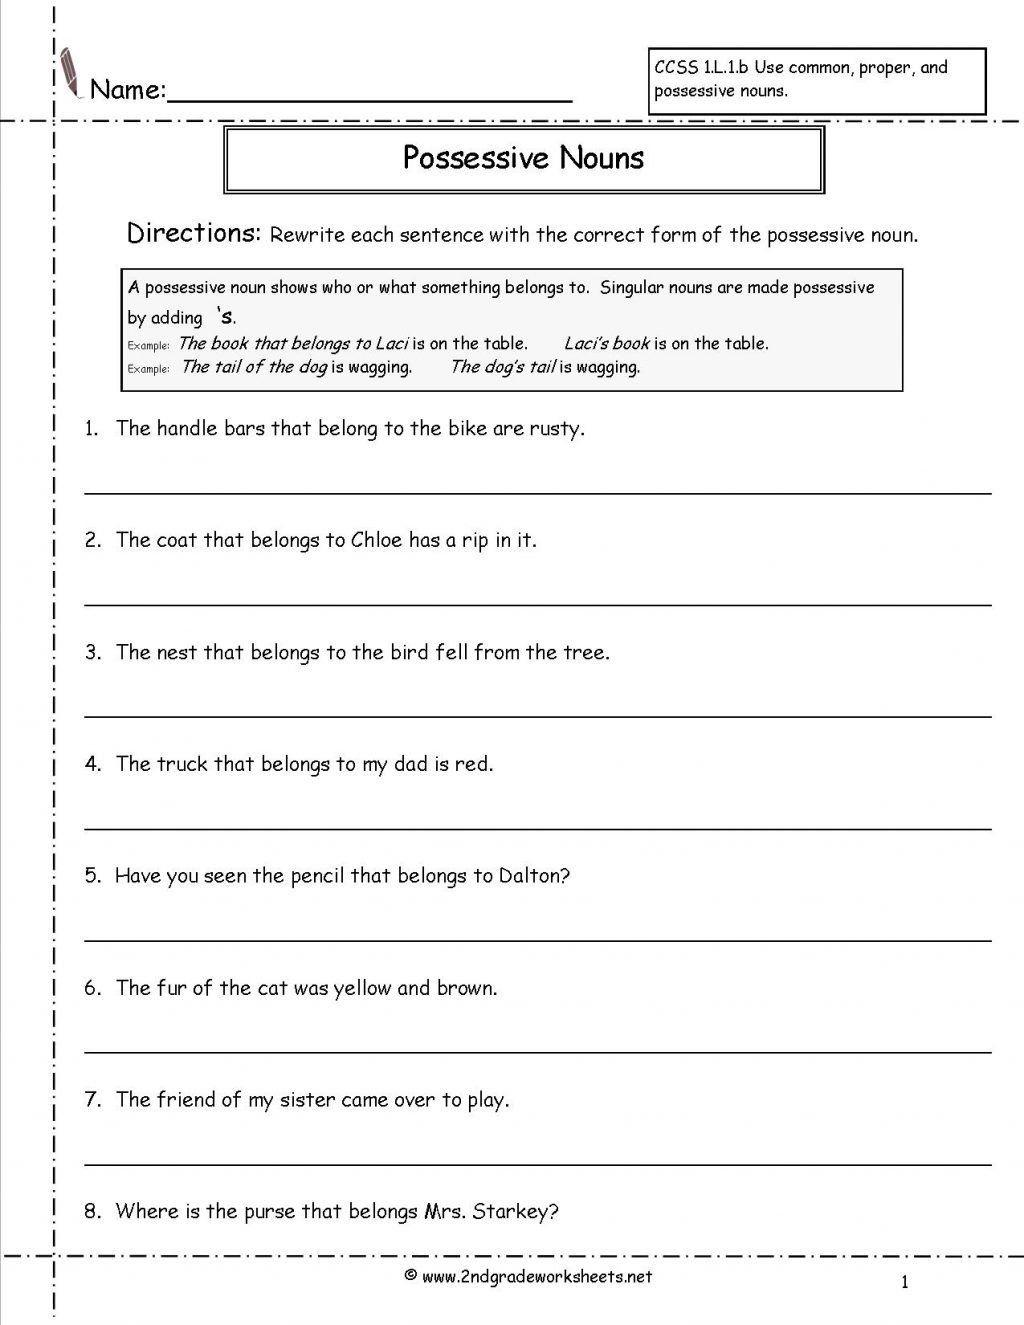 medium resolution of Second Grade Pronoun Worksheets Worksheet Ideas Second Grade Possessive  Nounss astonishi… in 2020   Possessive nouns worksheets